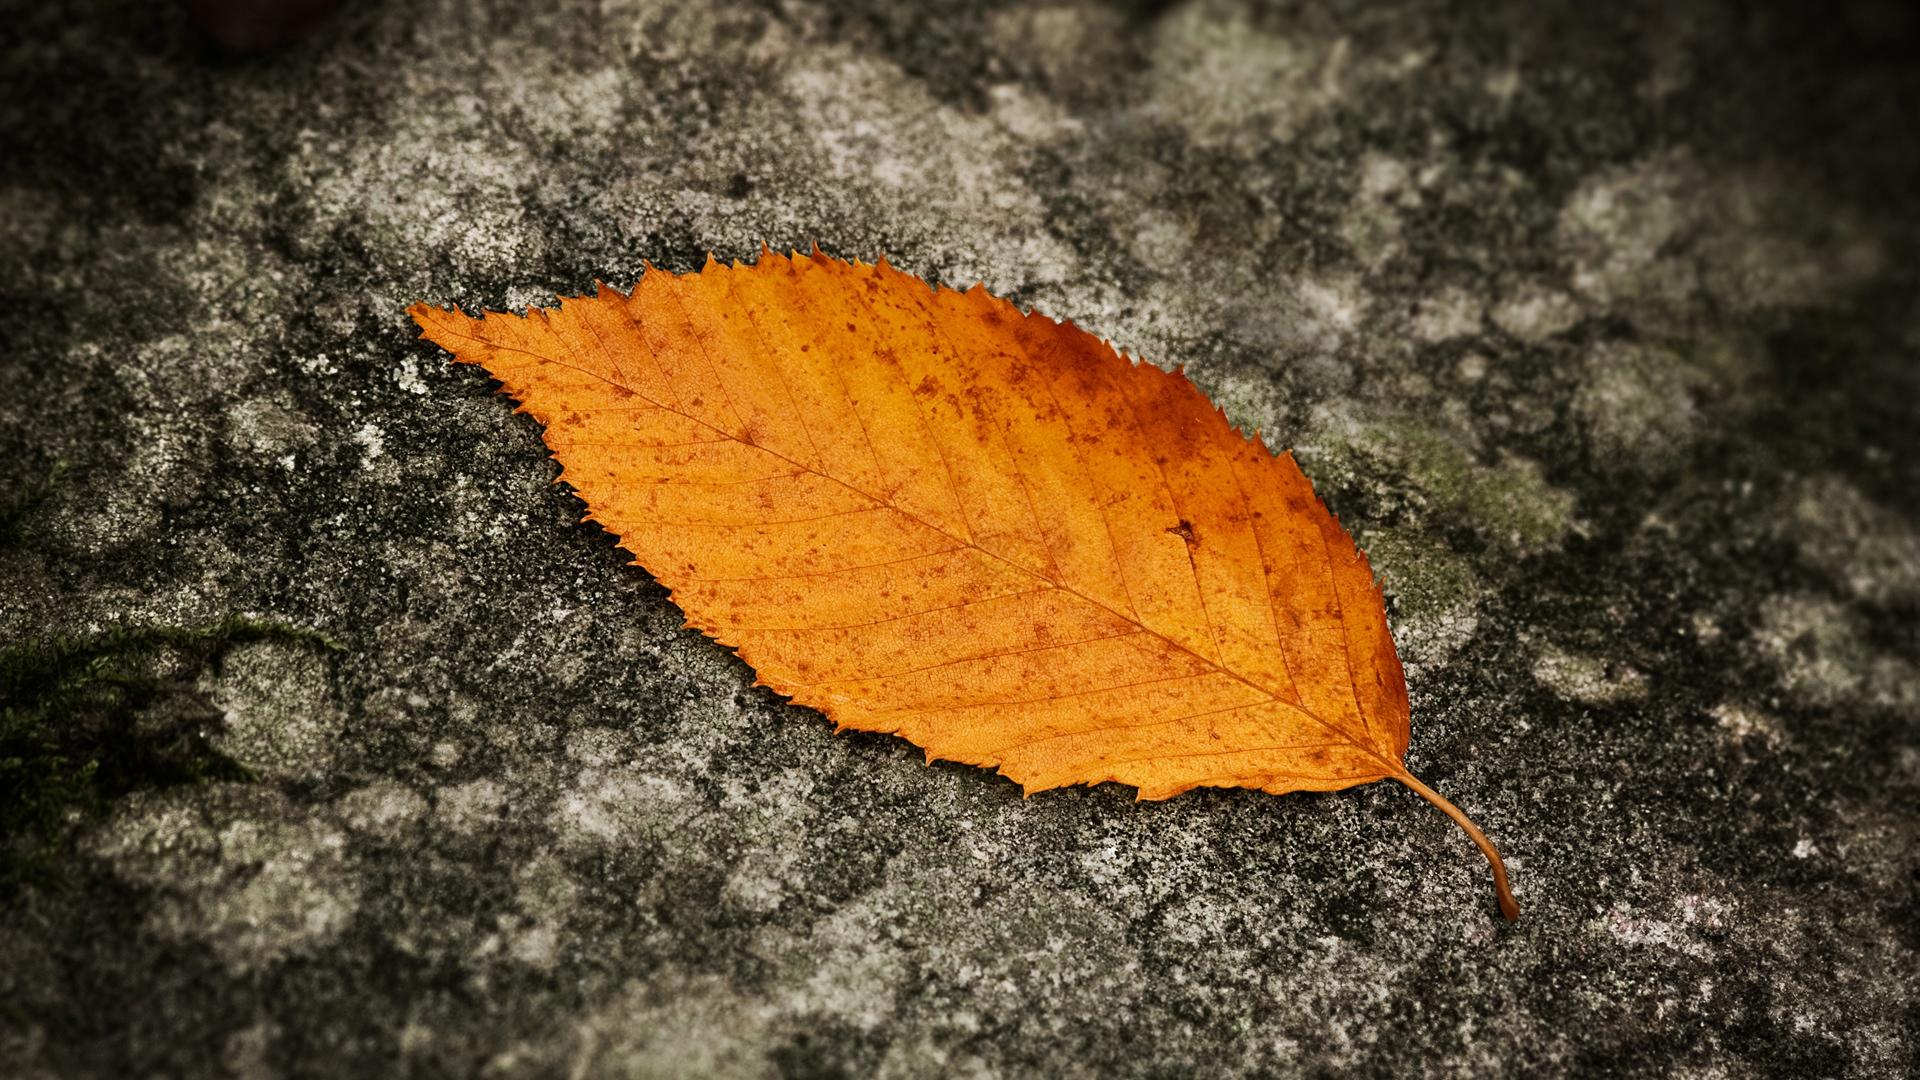 Fallen Leaf 1920x1080 HDTV Amazing Landscape Photographies of Sven Müller